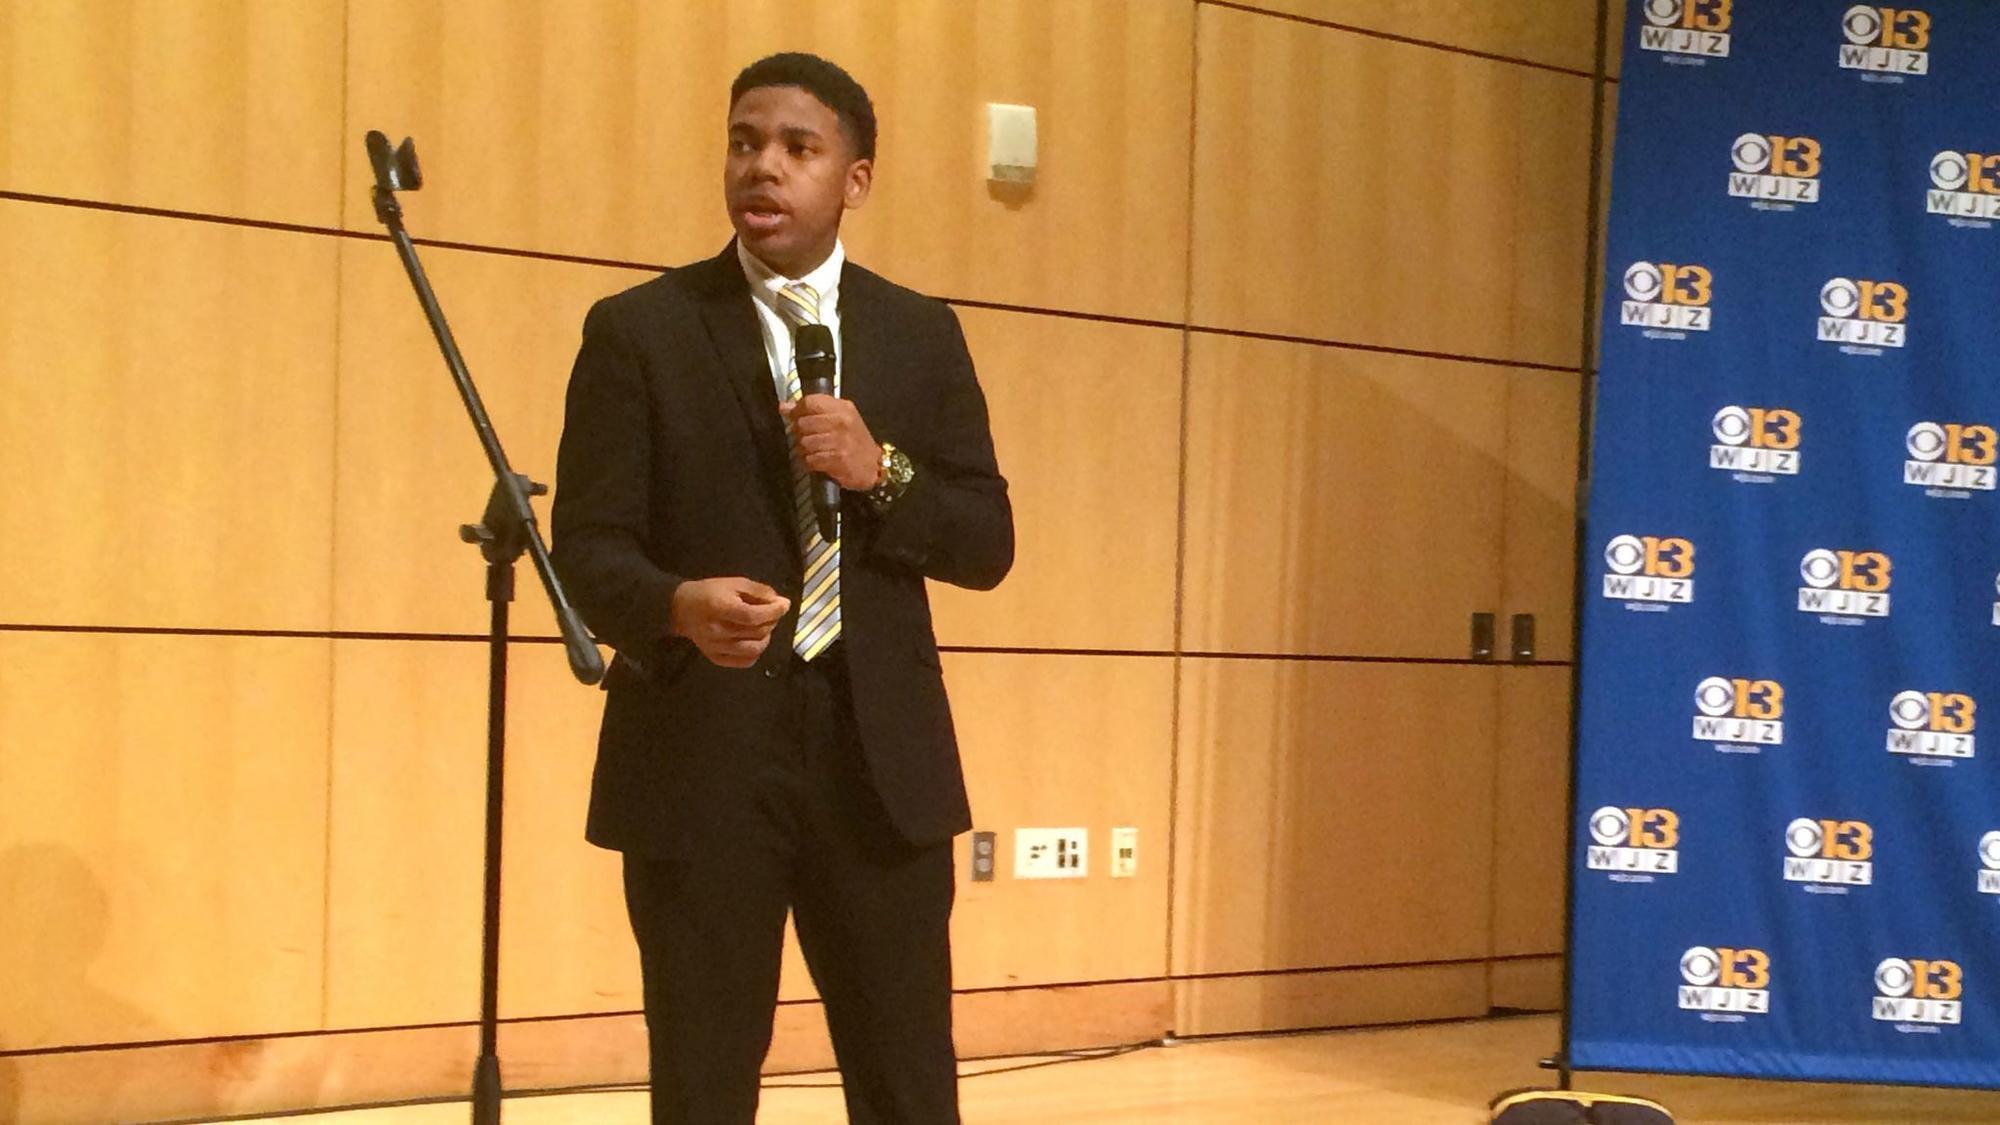 Mount Zion Baptist Christian School junior wins WJZ's 2018 Black History oratory competition